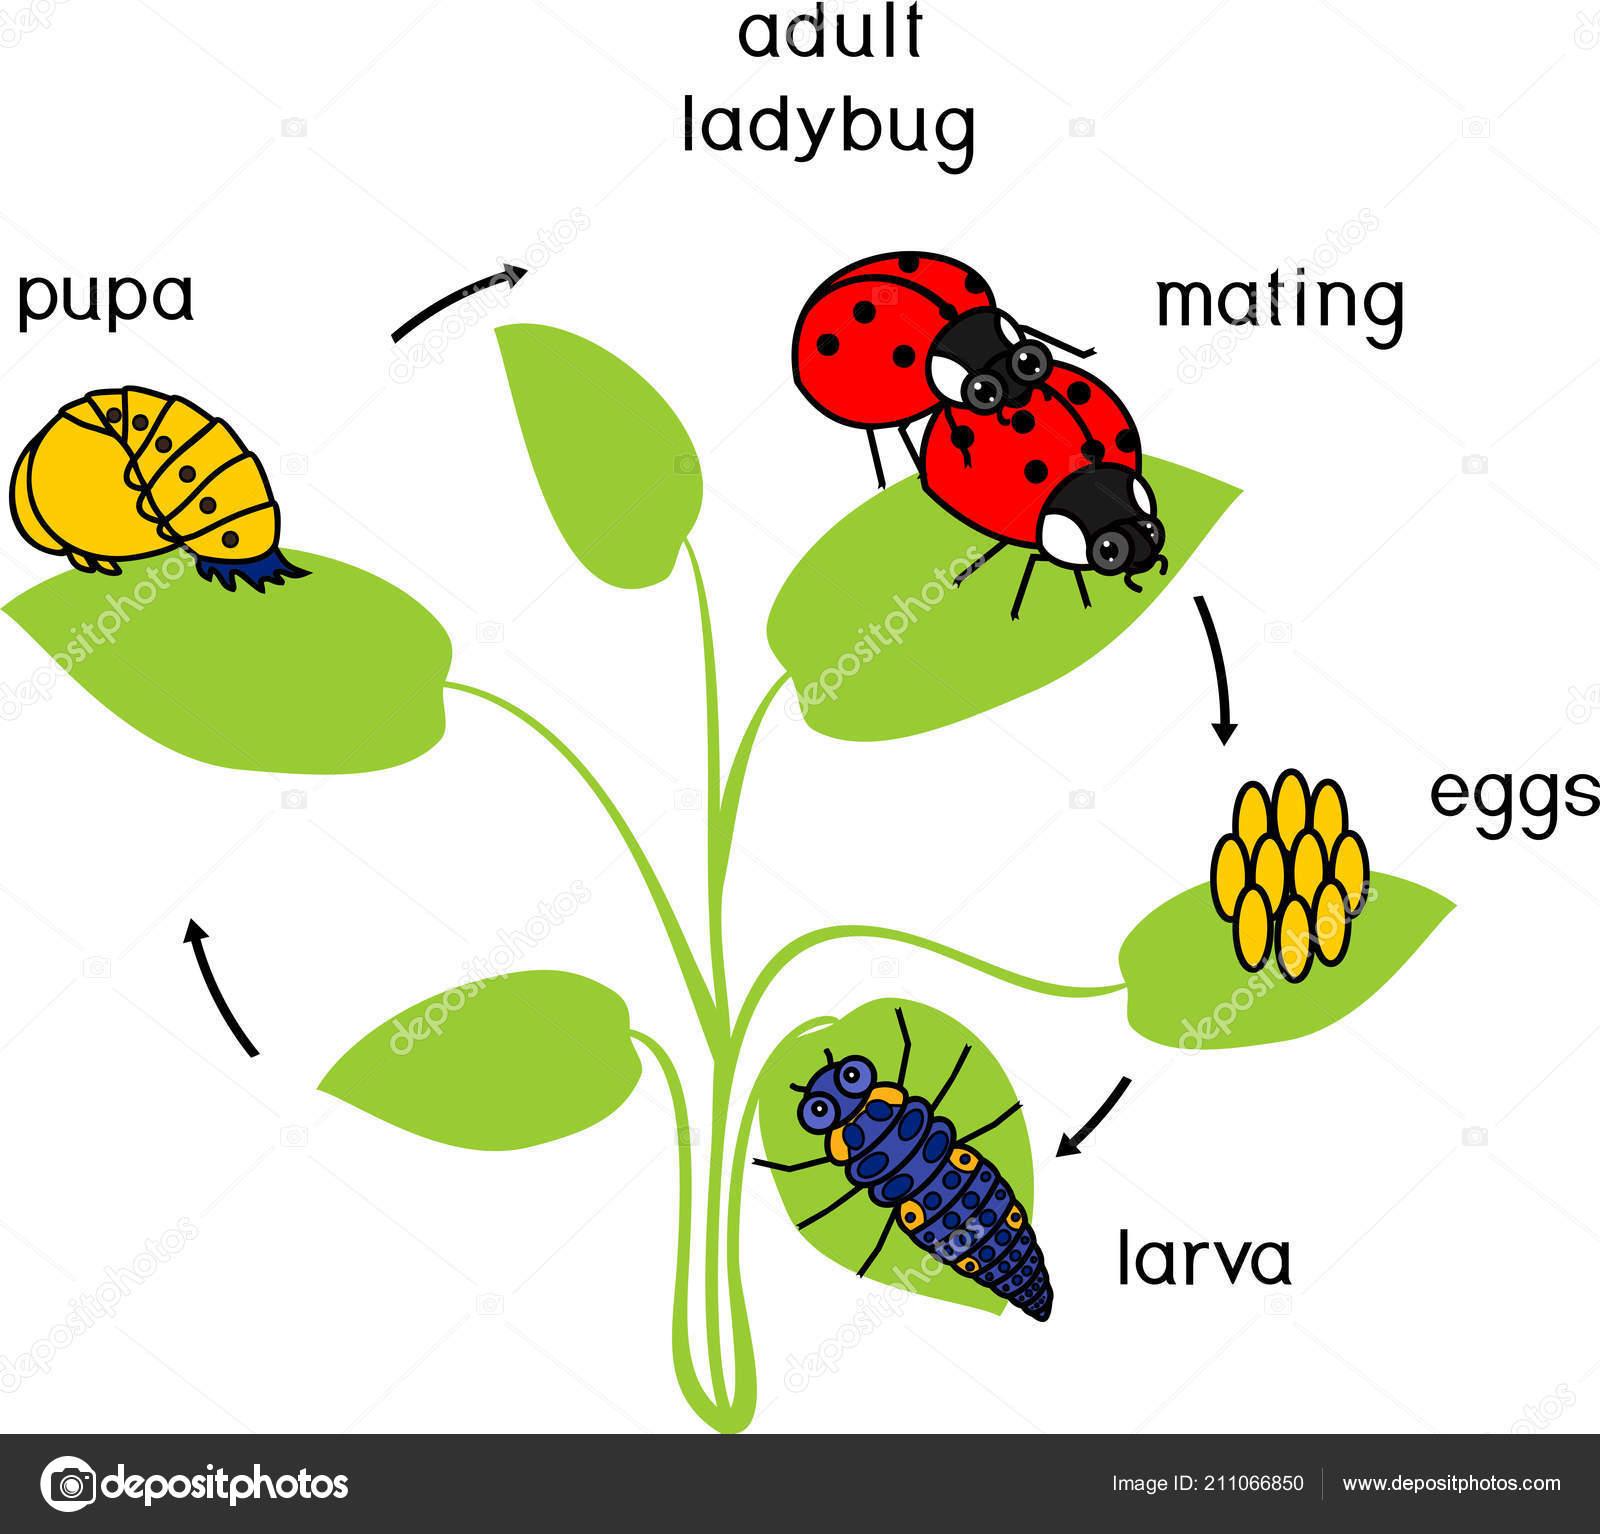 Life Cycle Ladybug Sequence Stages Development Ladybug Egg